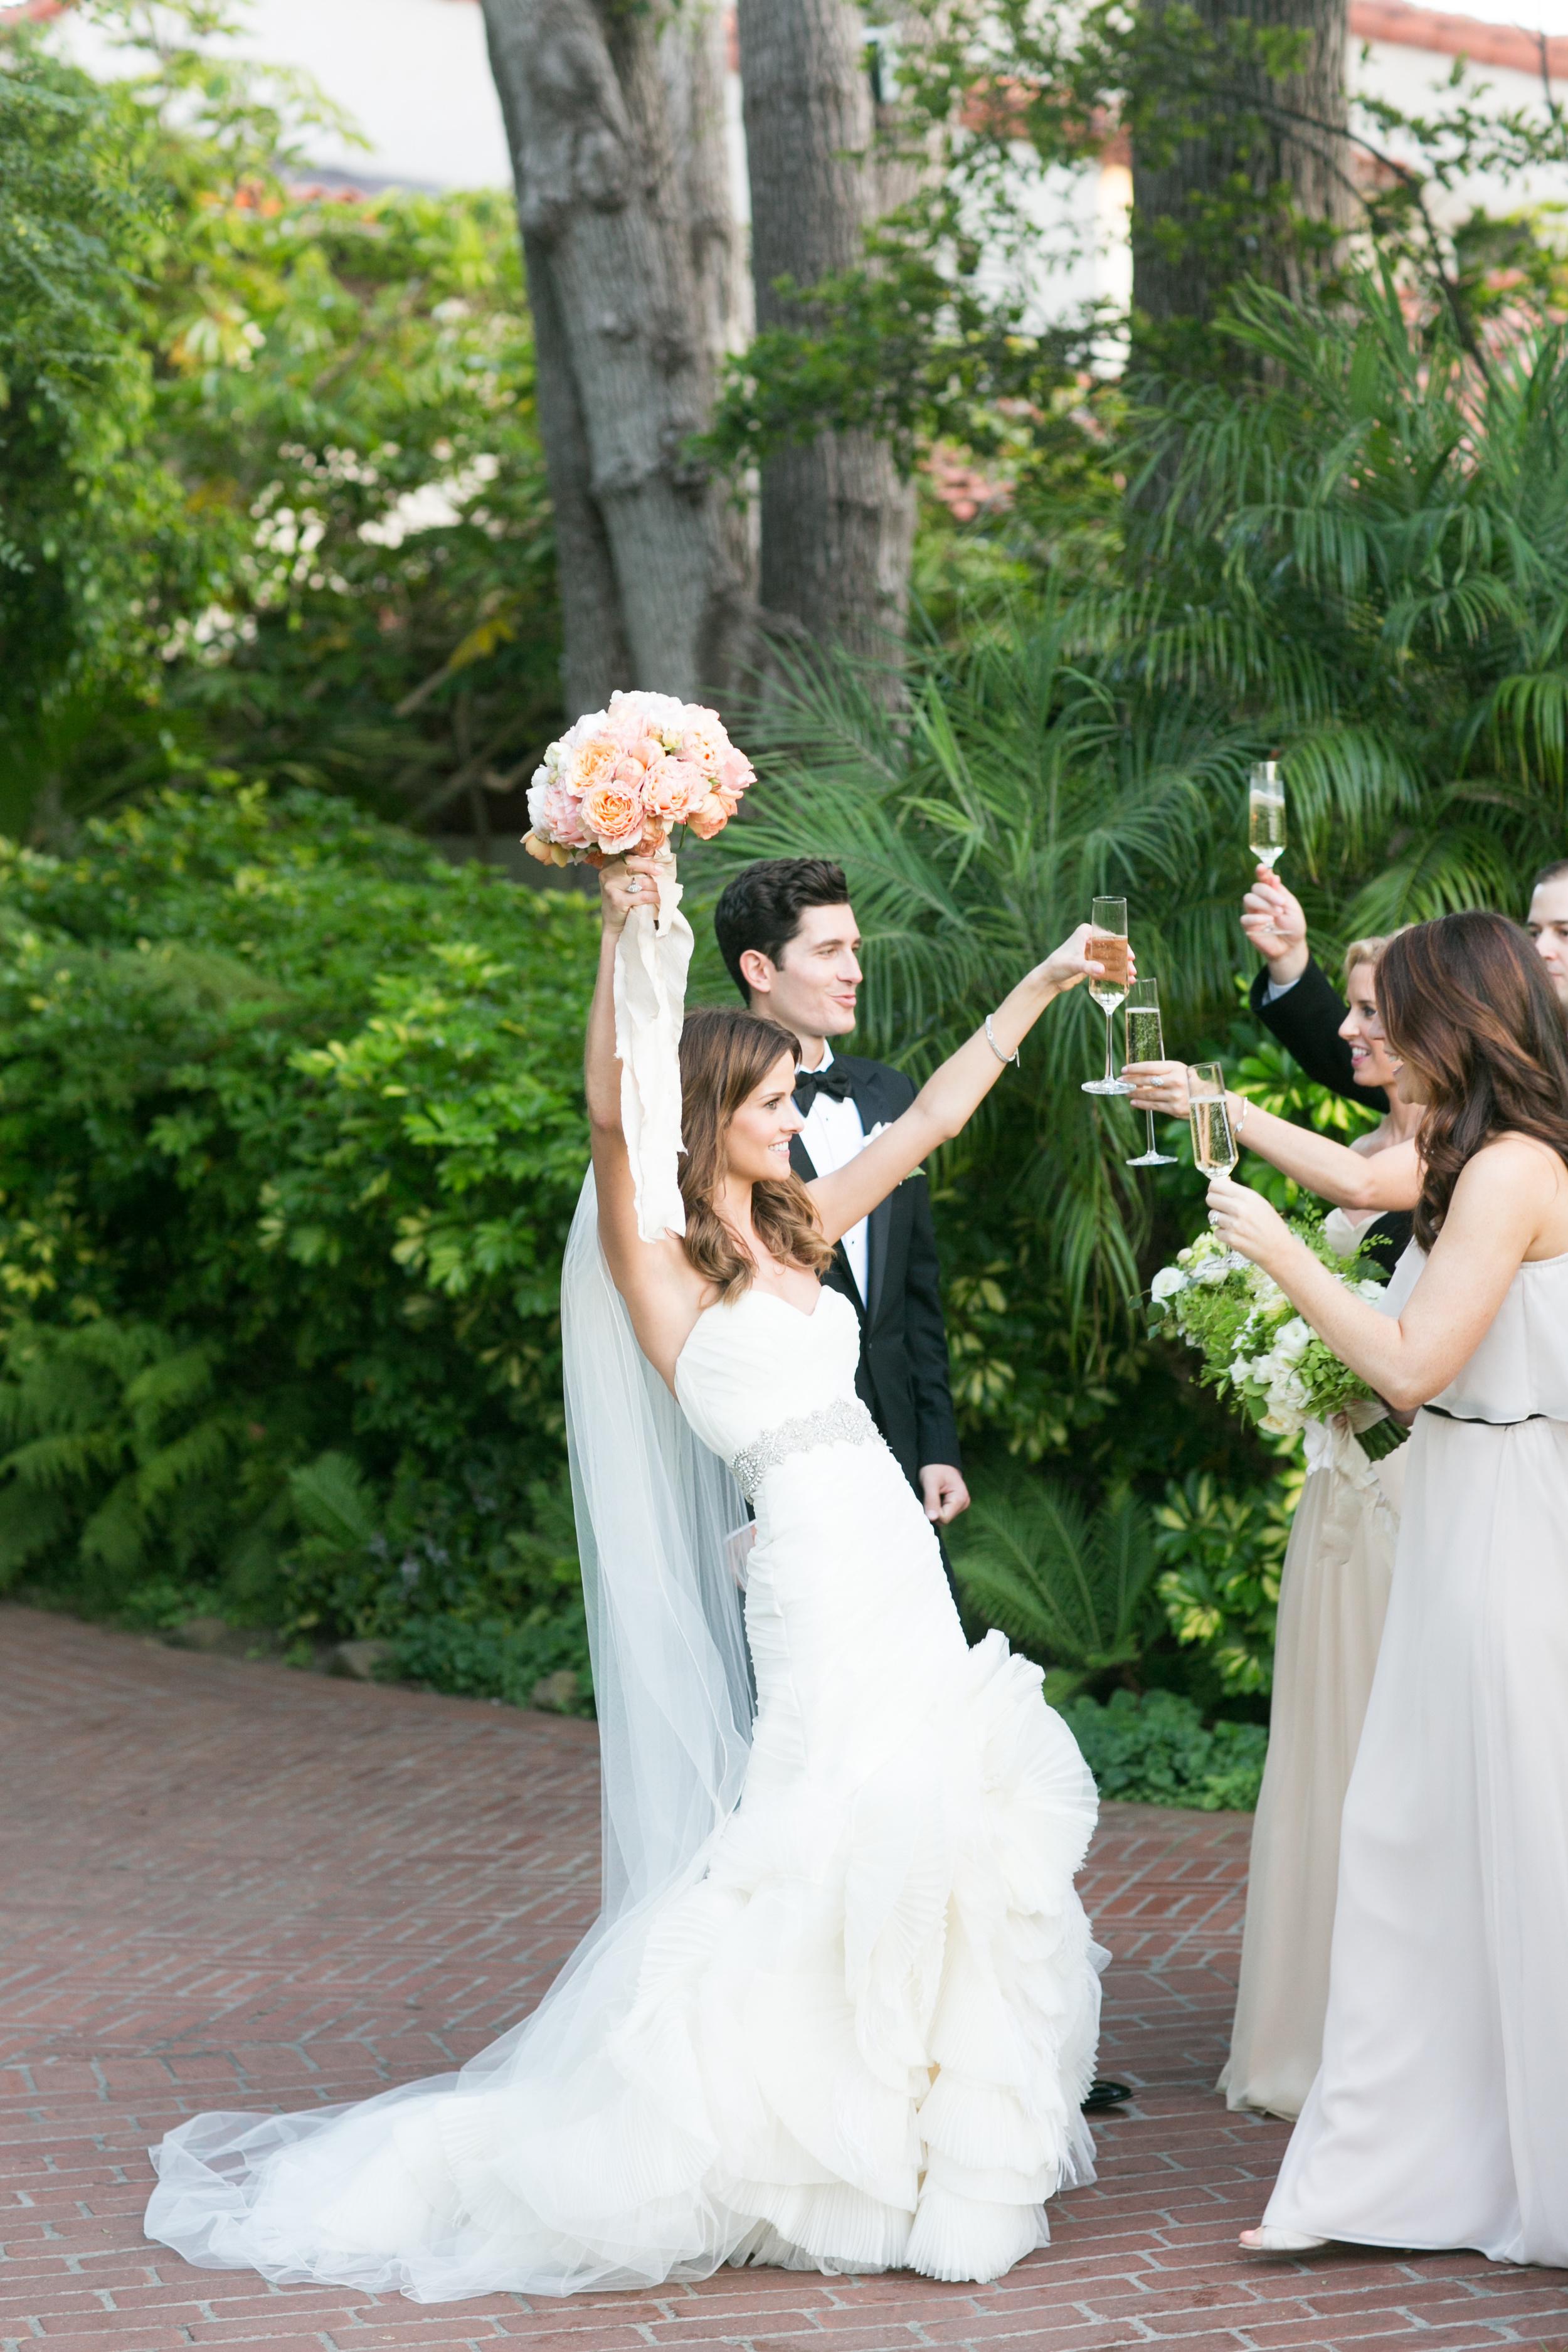 michellebeller.com   Four Seasons Biltmore Wedding   Michelle Beller Photography